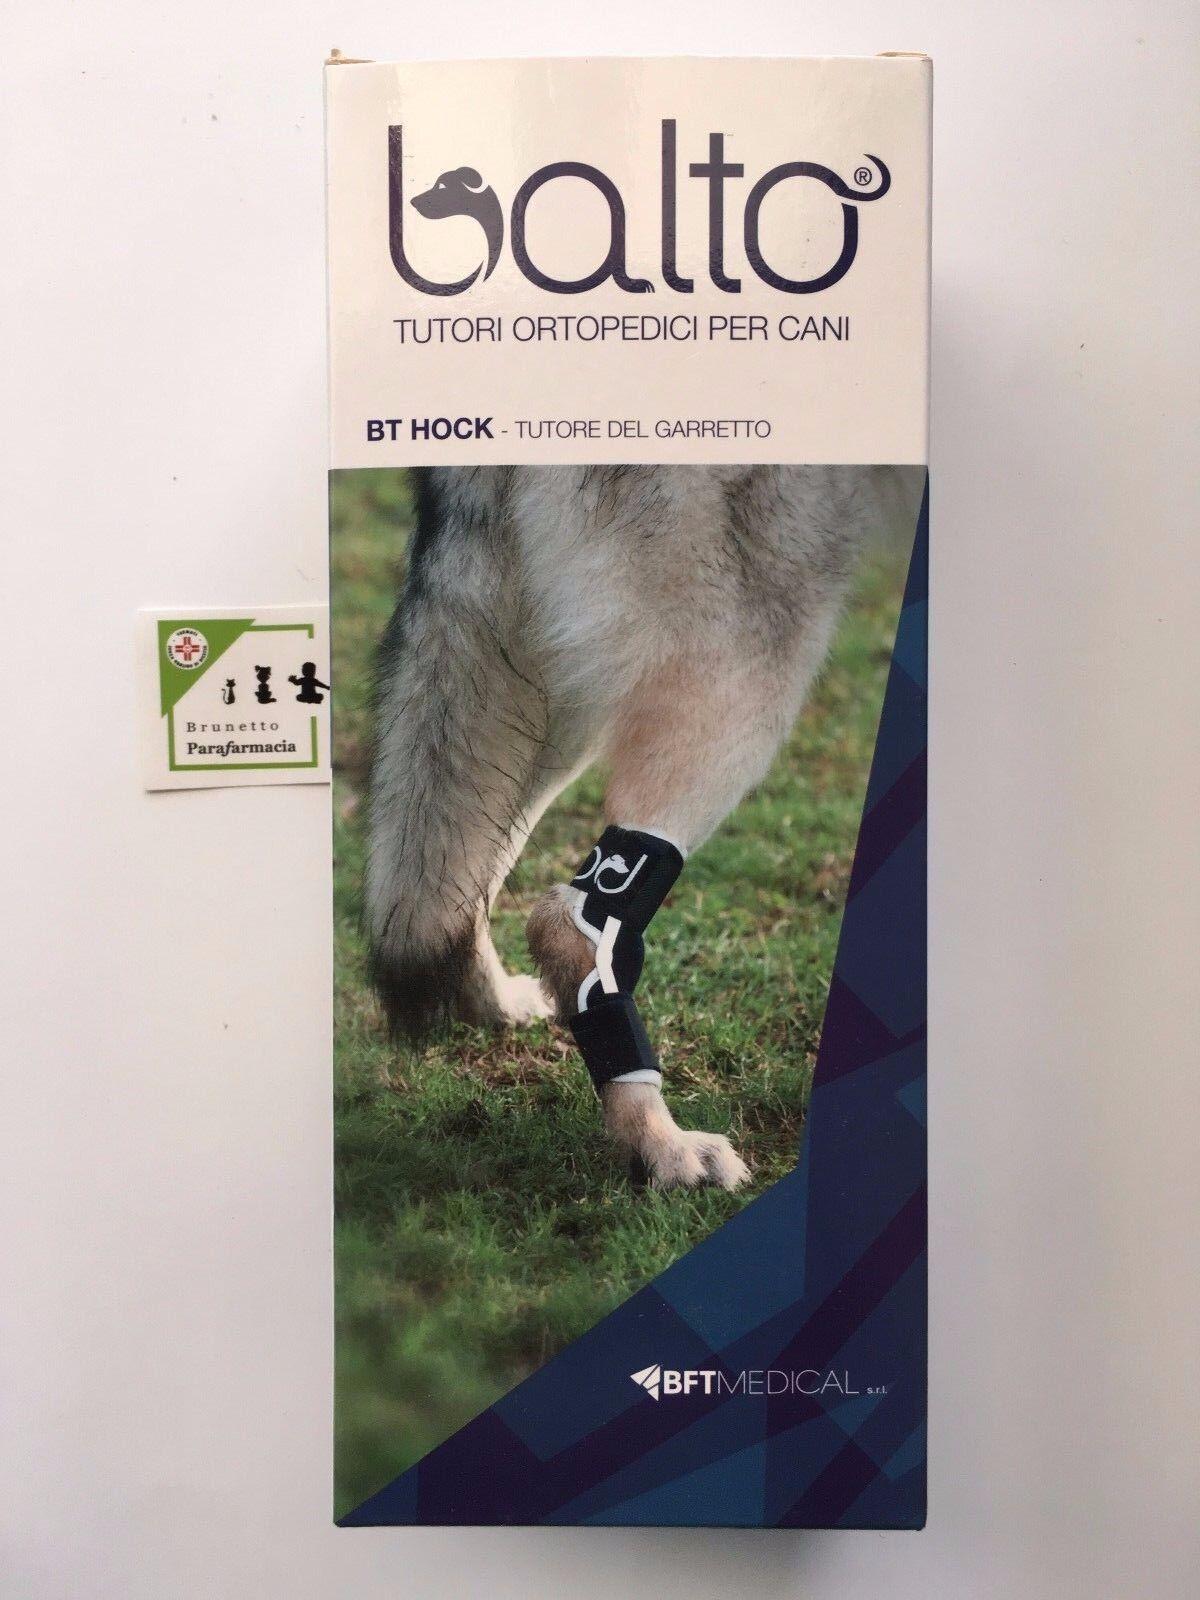 Balto BT BT BT HOCK tutore DEL GARRETTO per CANE - BTFMEDICAL ab0737